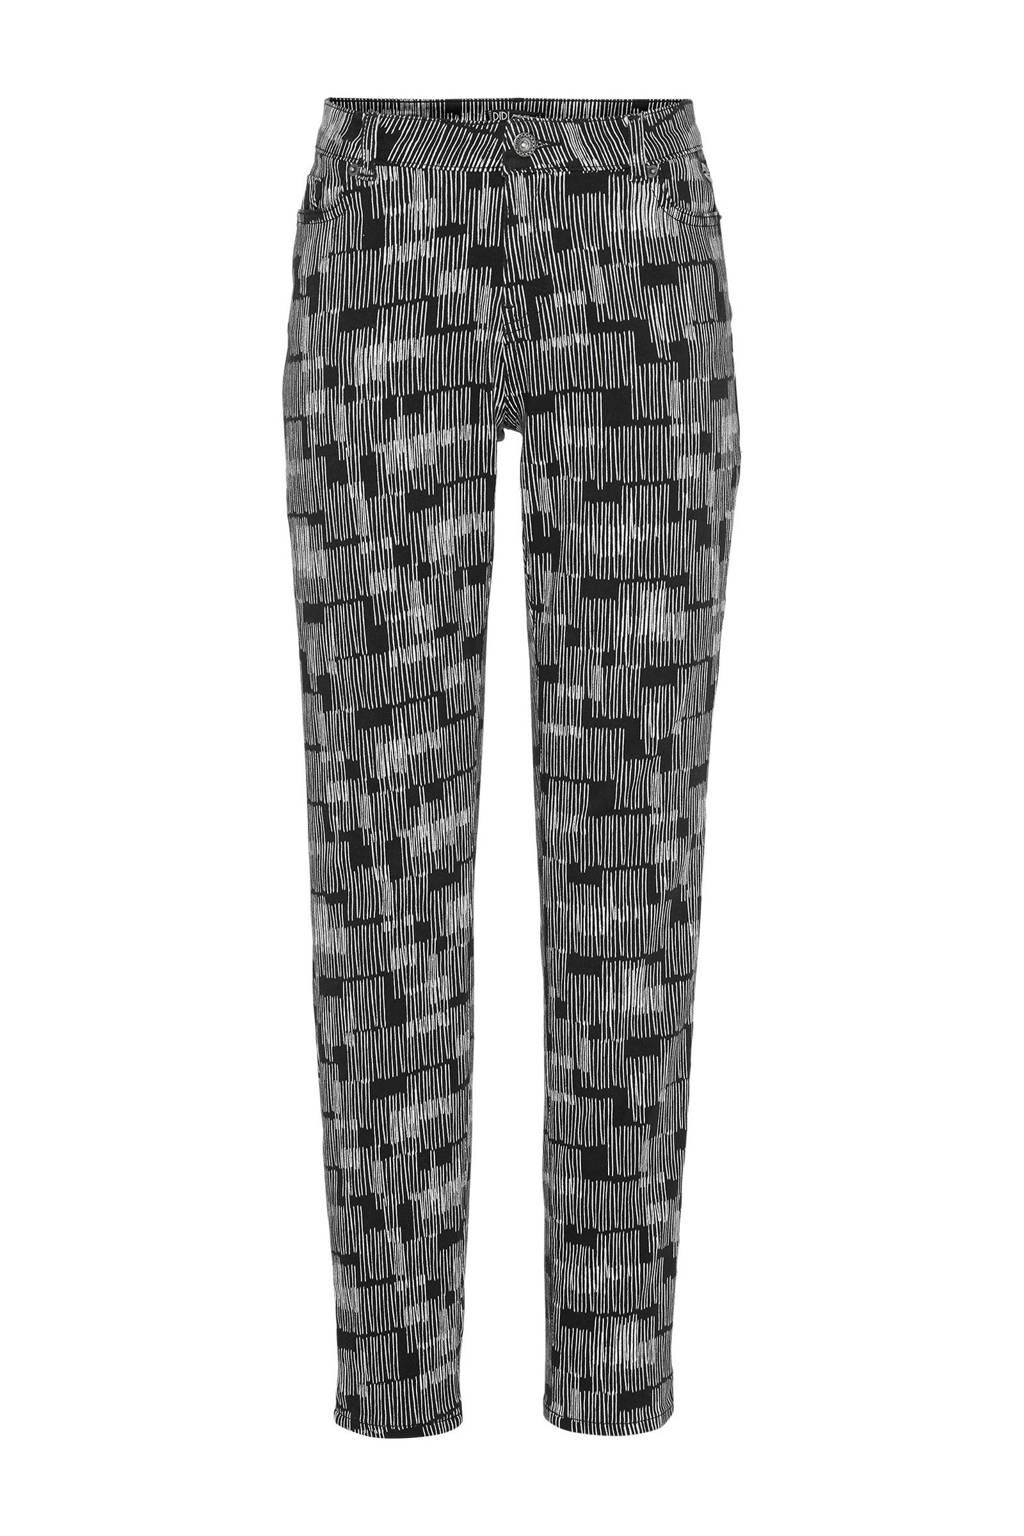 Didi  skinny broek met allover print zwart, Zwart